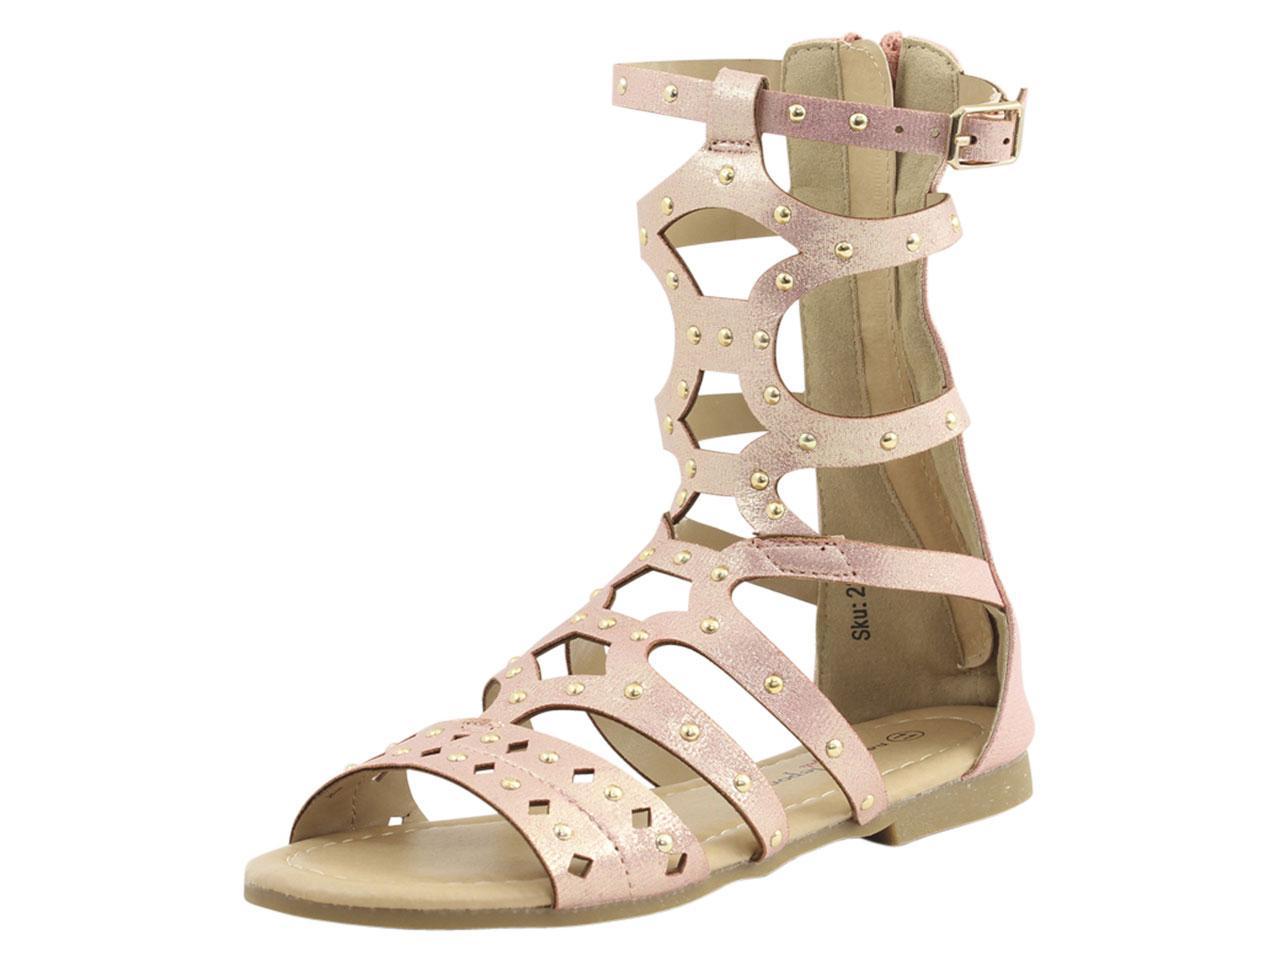 Image of Nanette Lepore Little/Big Girl's Studded Gladiator Sandals Shoes - Pink Metallic - 3 M US Little Kid